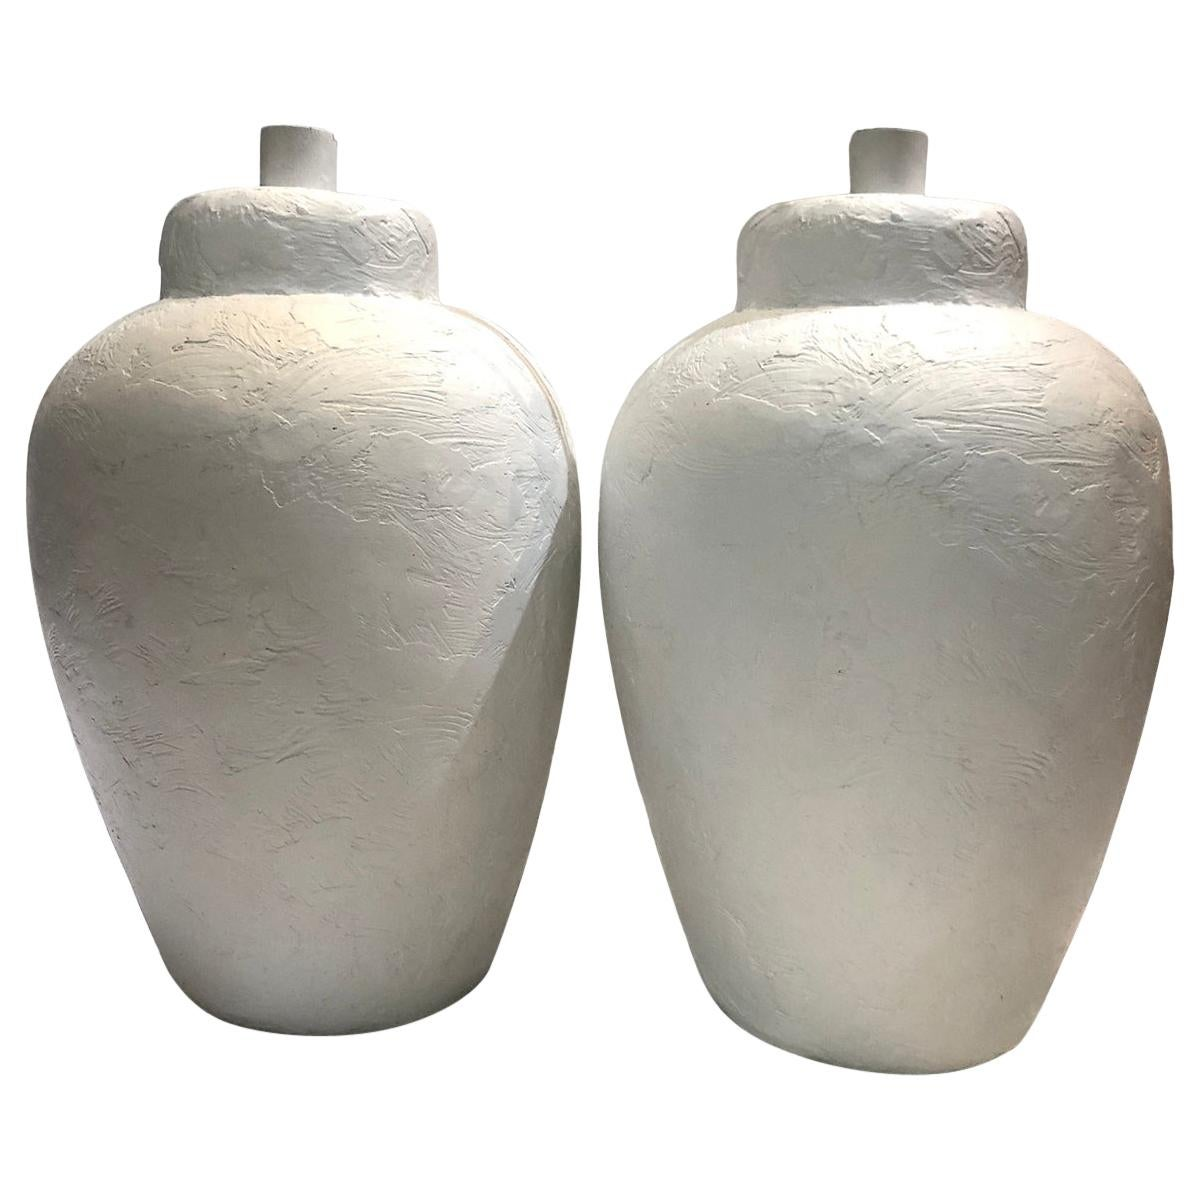 Pair of White Ceramic Table Lamps